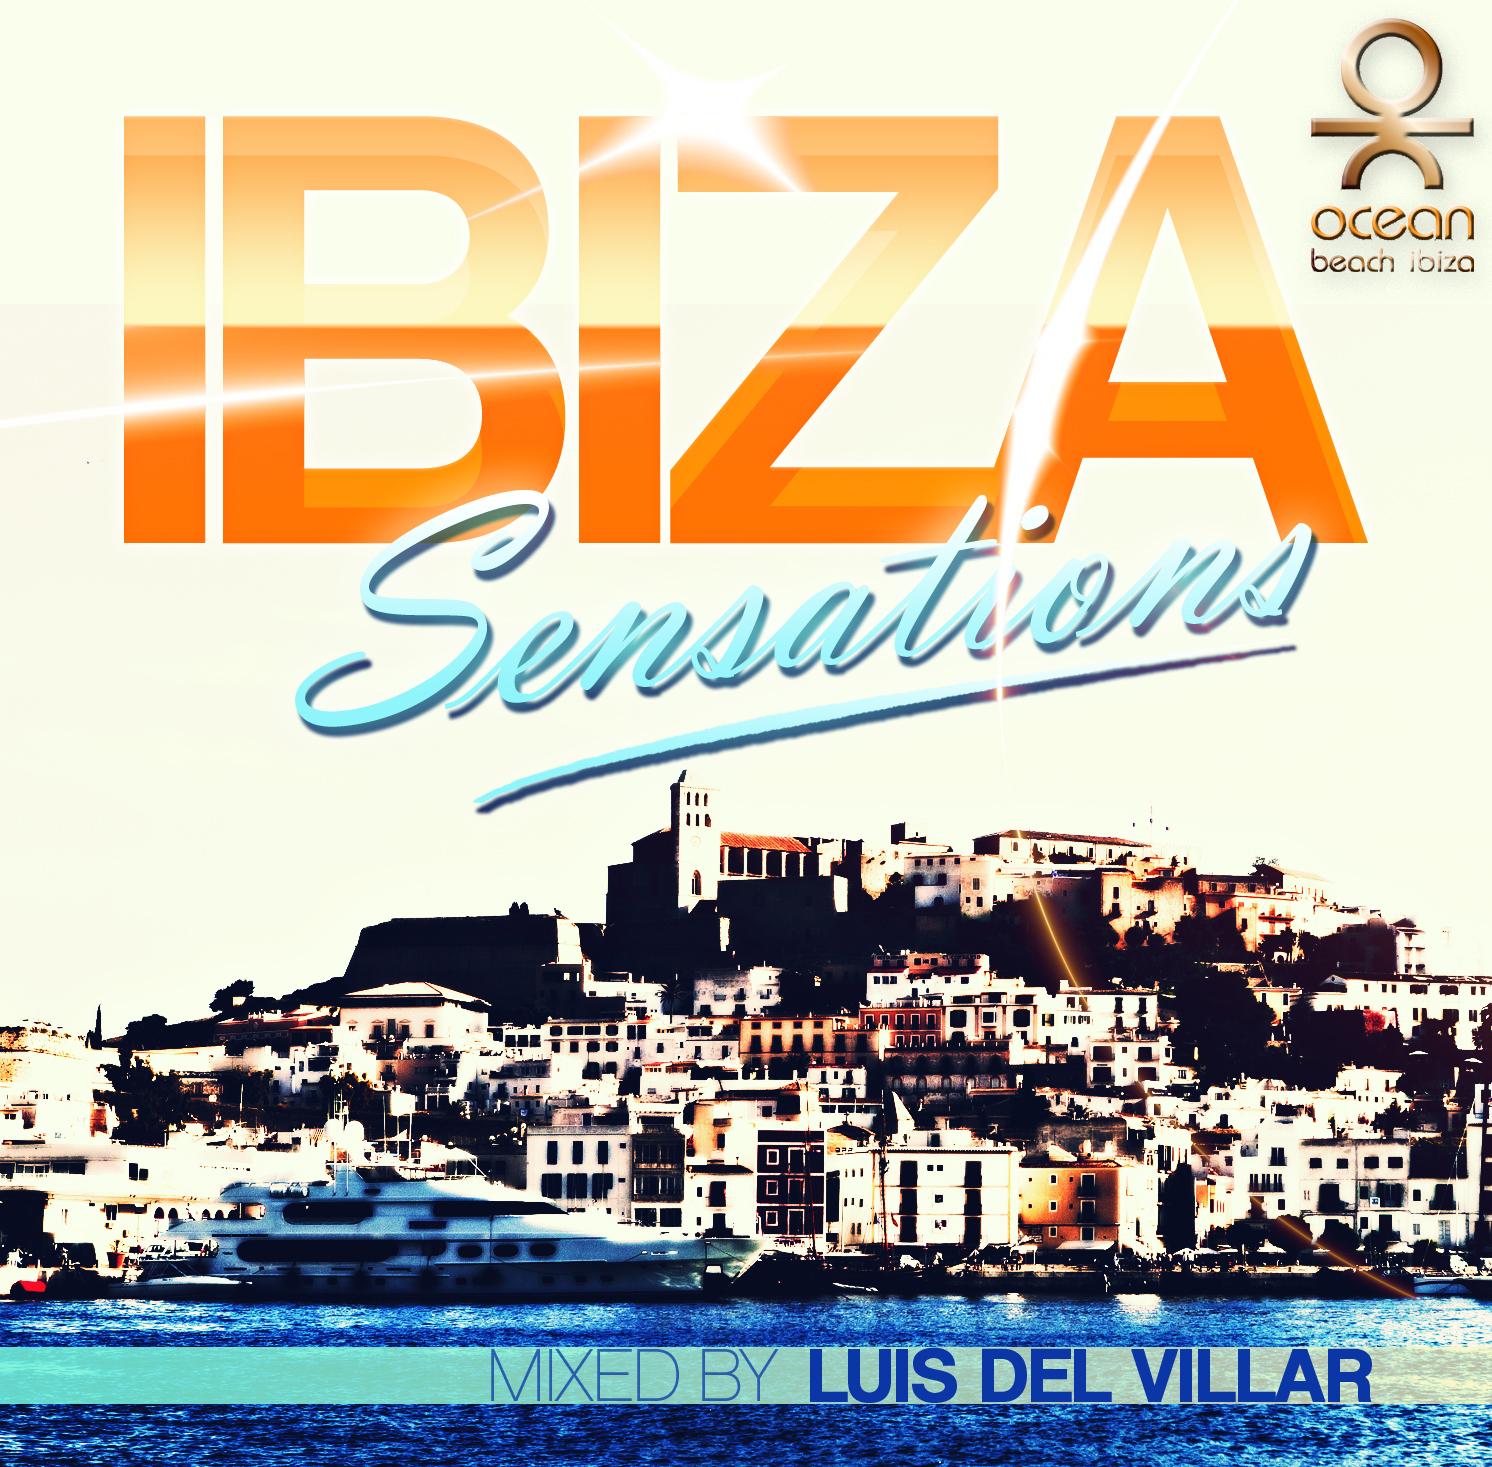 Artwork for Ibiza Sensations 124 Winter residences Hotel W Barcelona & W Doha